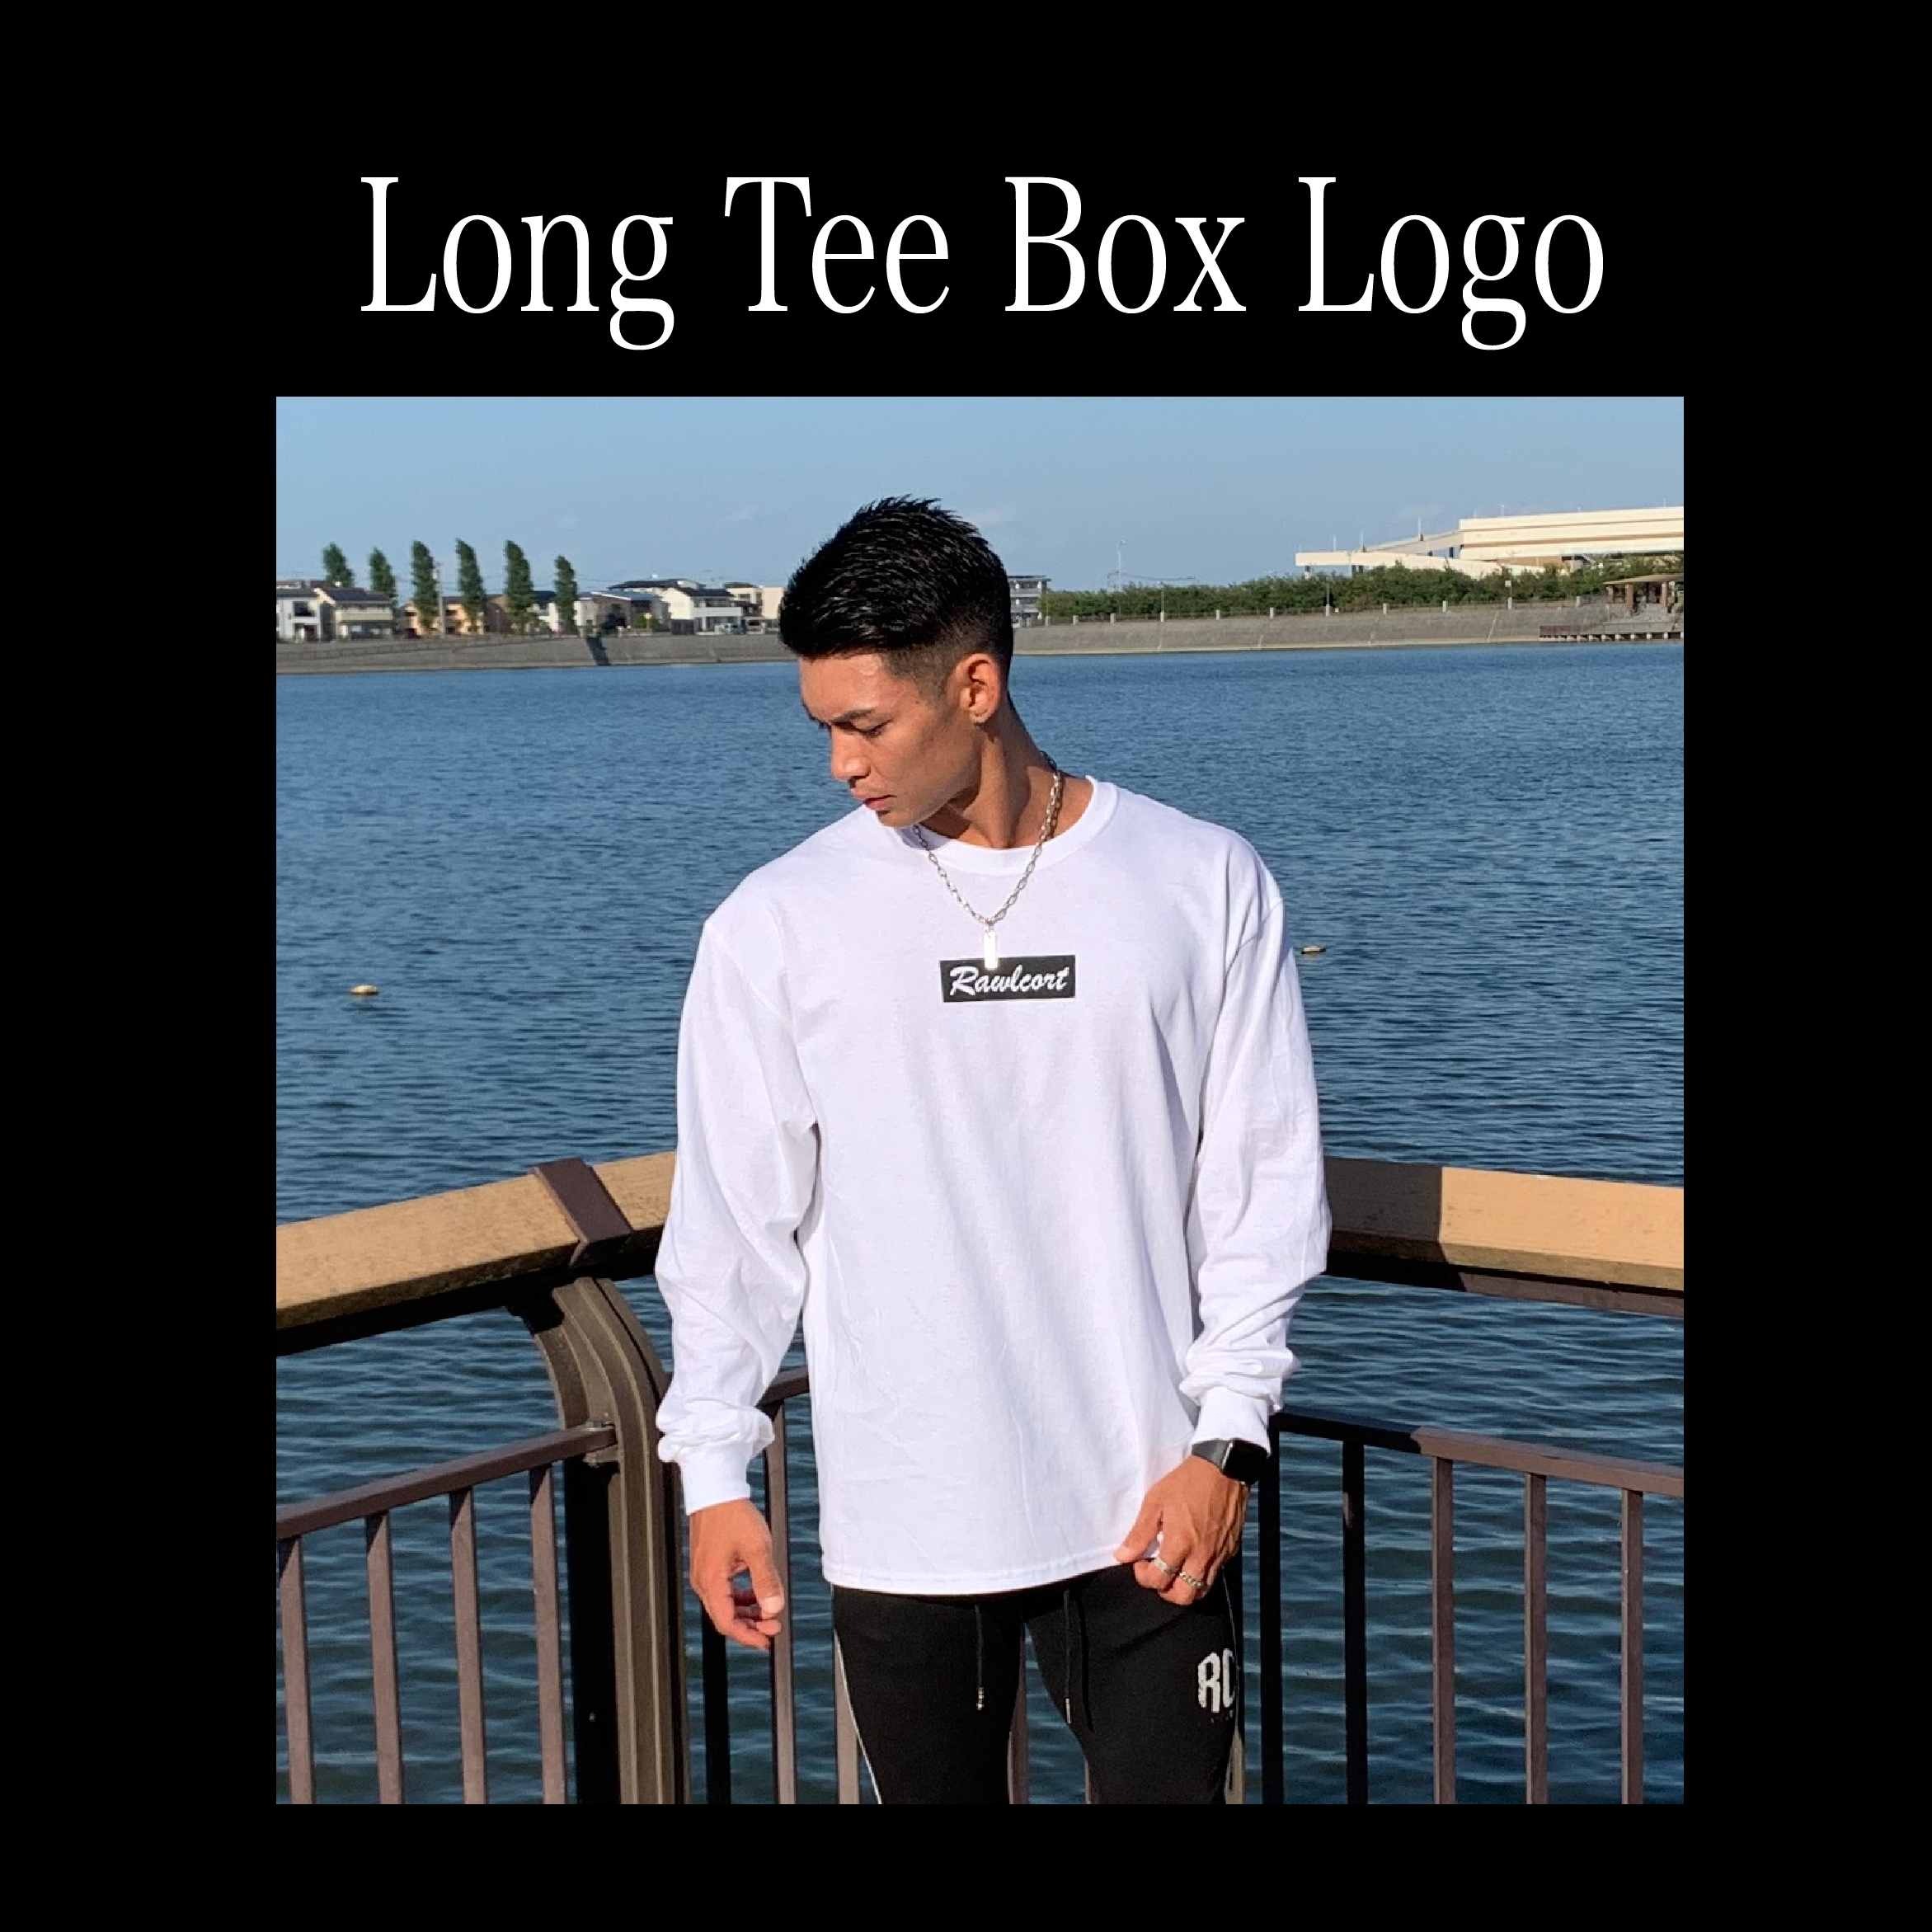 Long Tee Box Logo